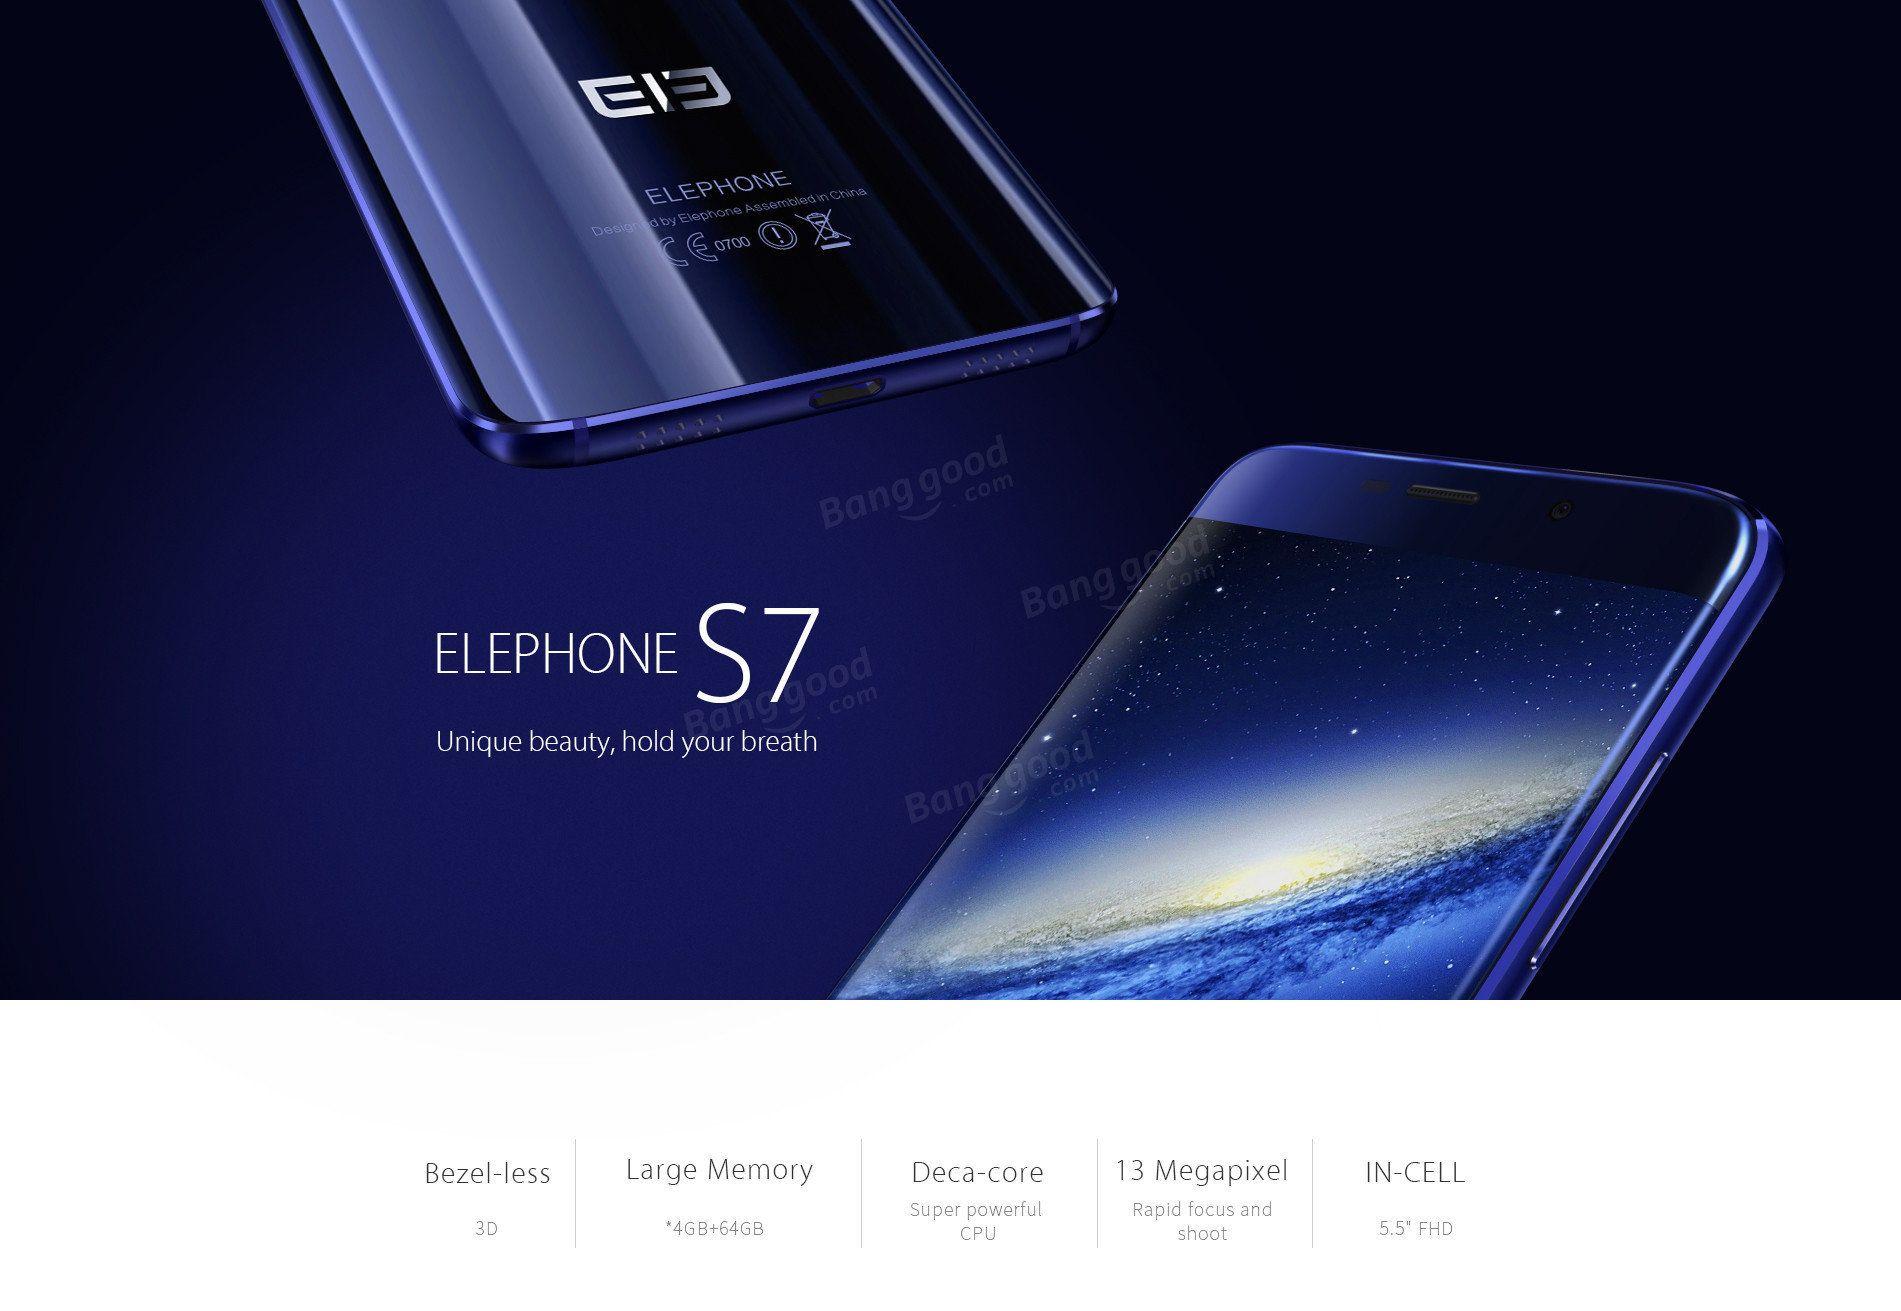 Elephone S7 55 Inch Fingerprint 4gb Ram 64gb Rom Helio X20 Deca Xiaomi Redmi Note 3 2gb 16gb 4g Lte X10 Octa Core Smartphone